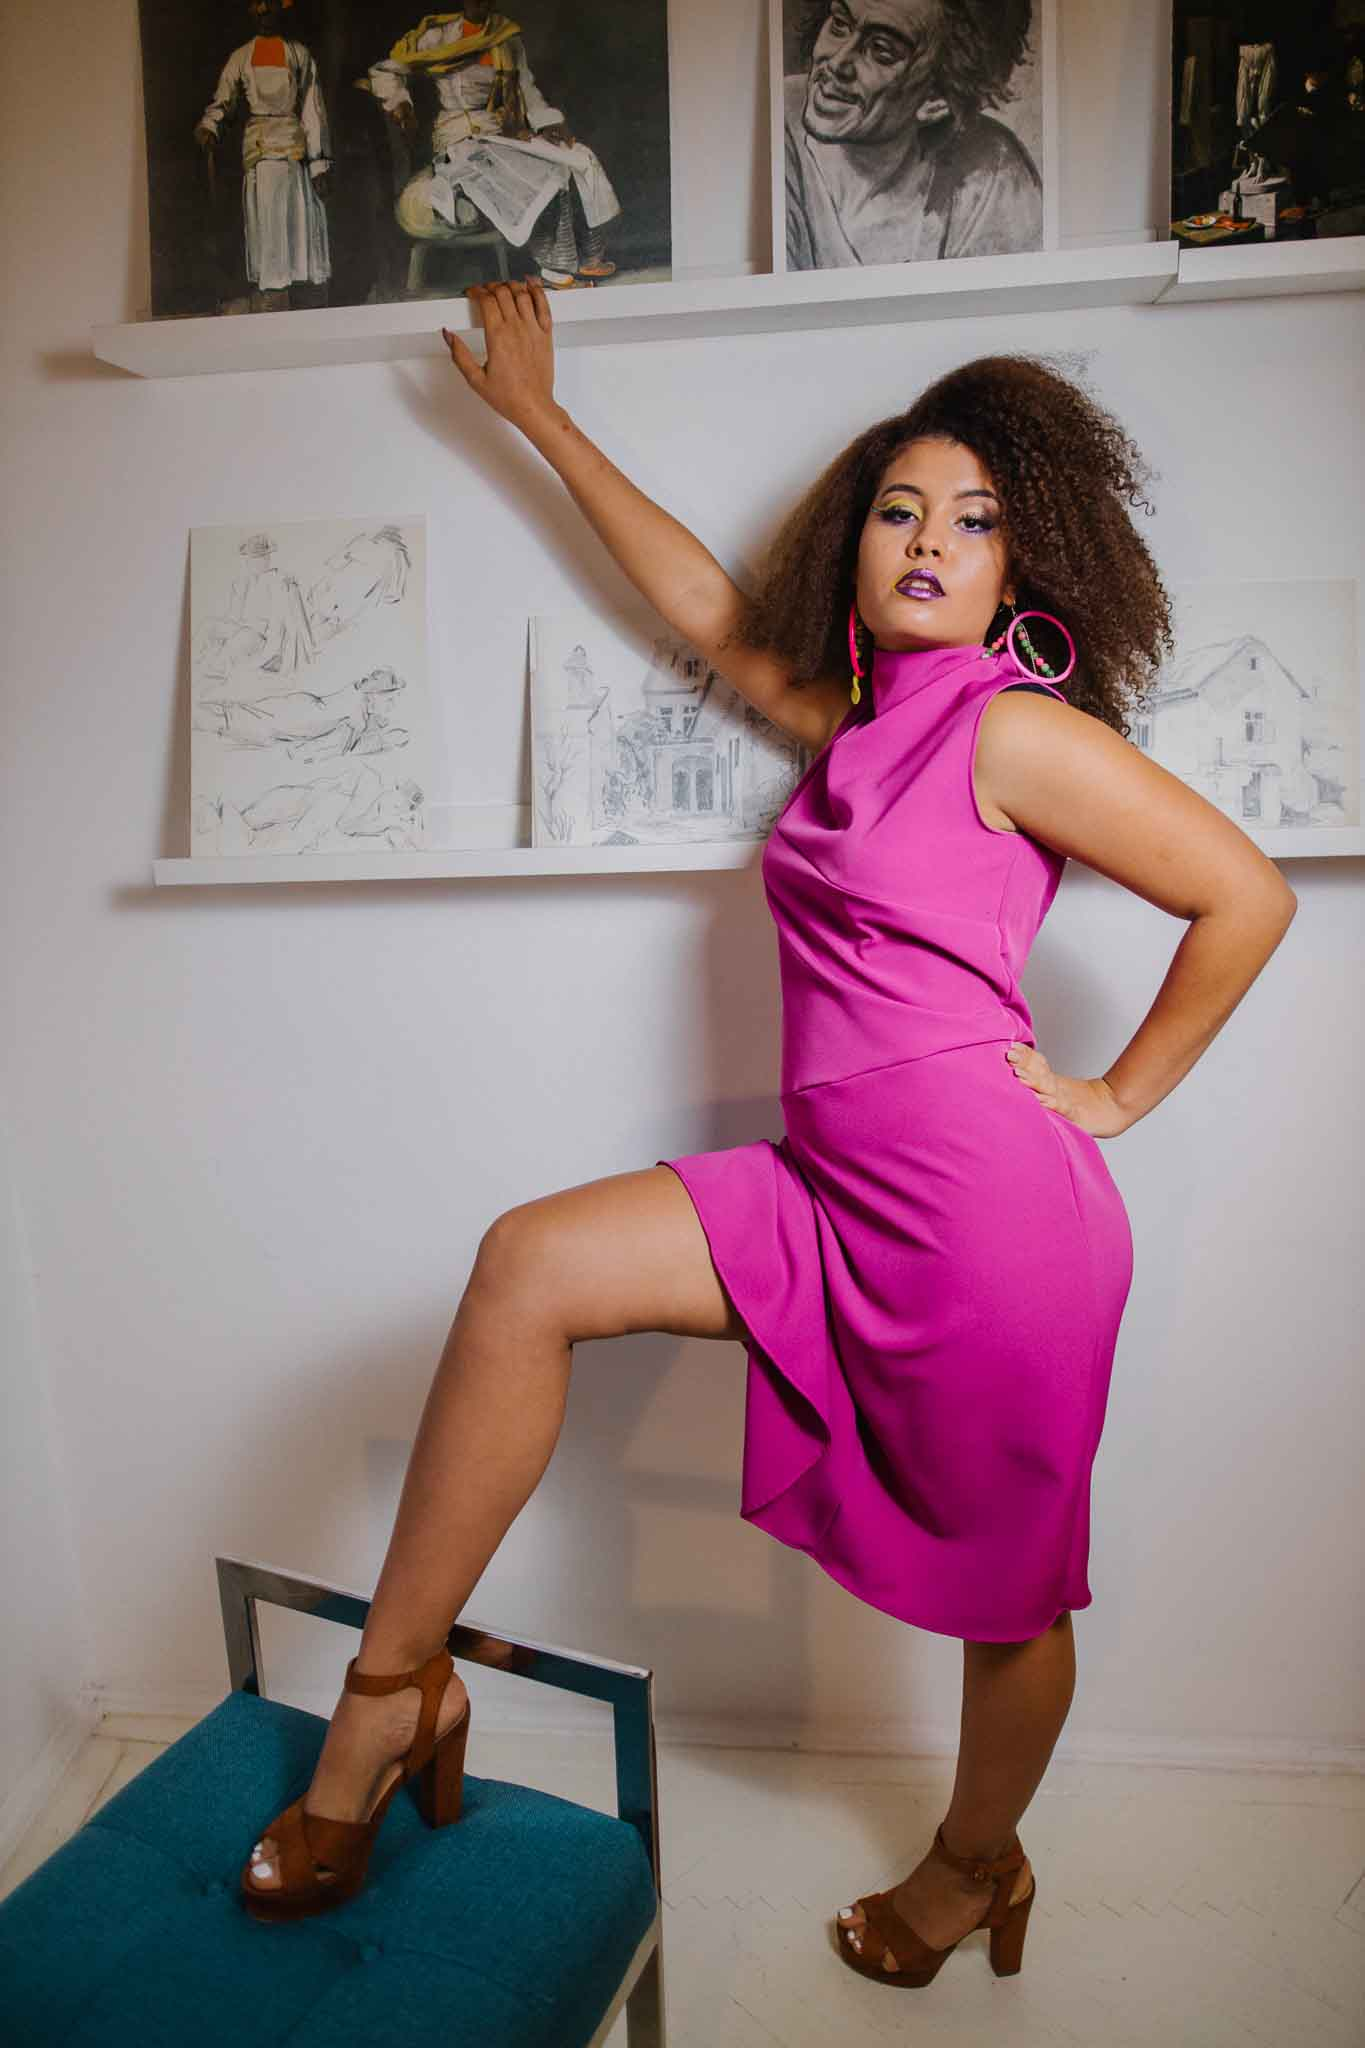 Asymmetric sleeveless dress in pink